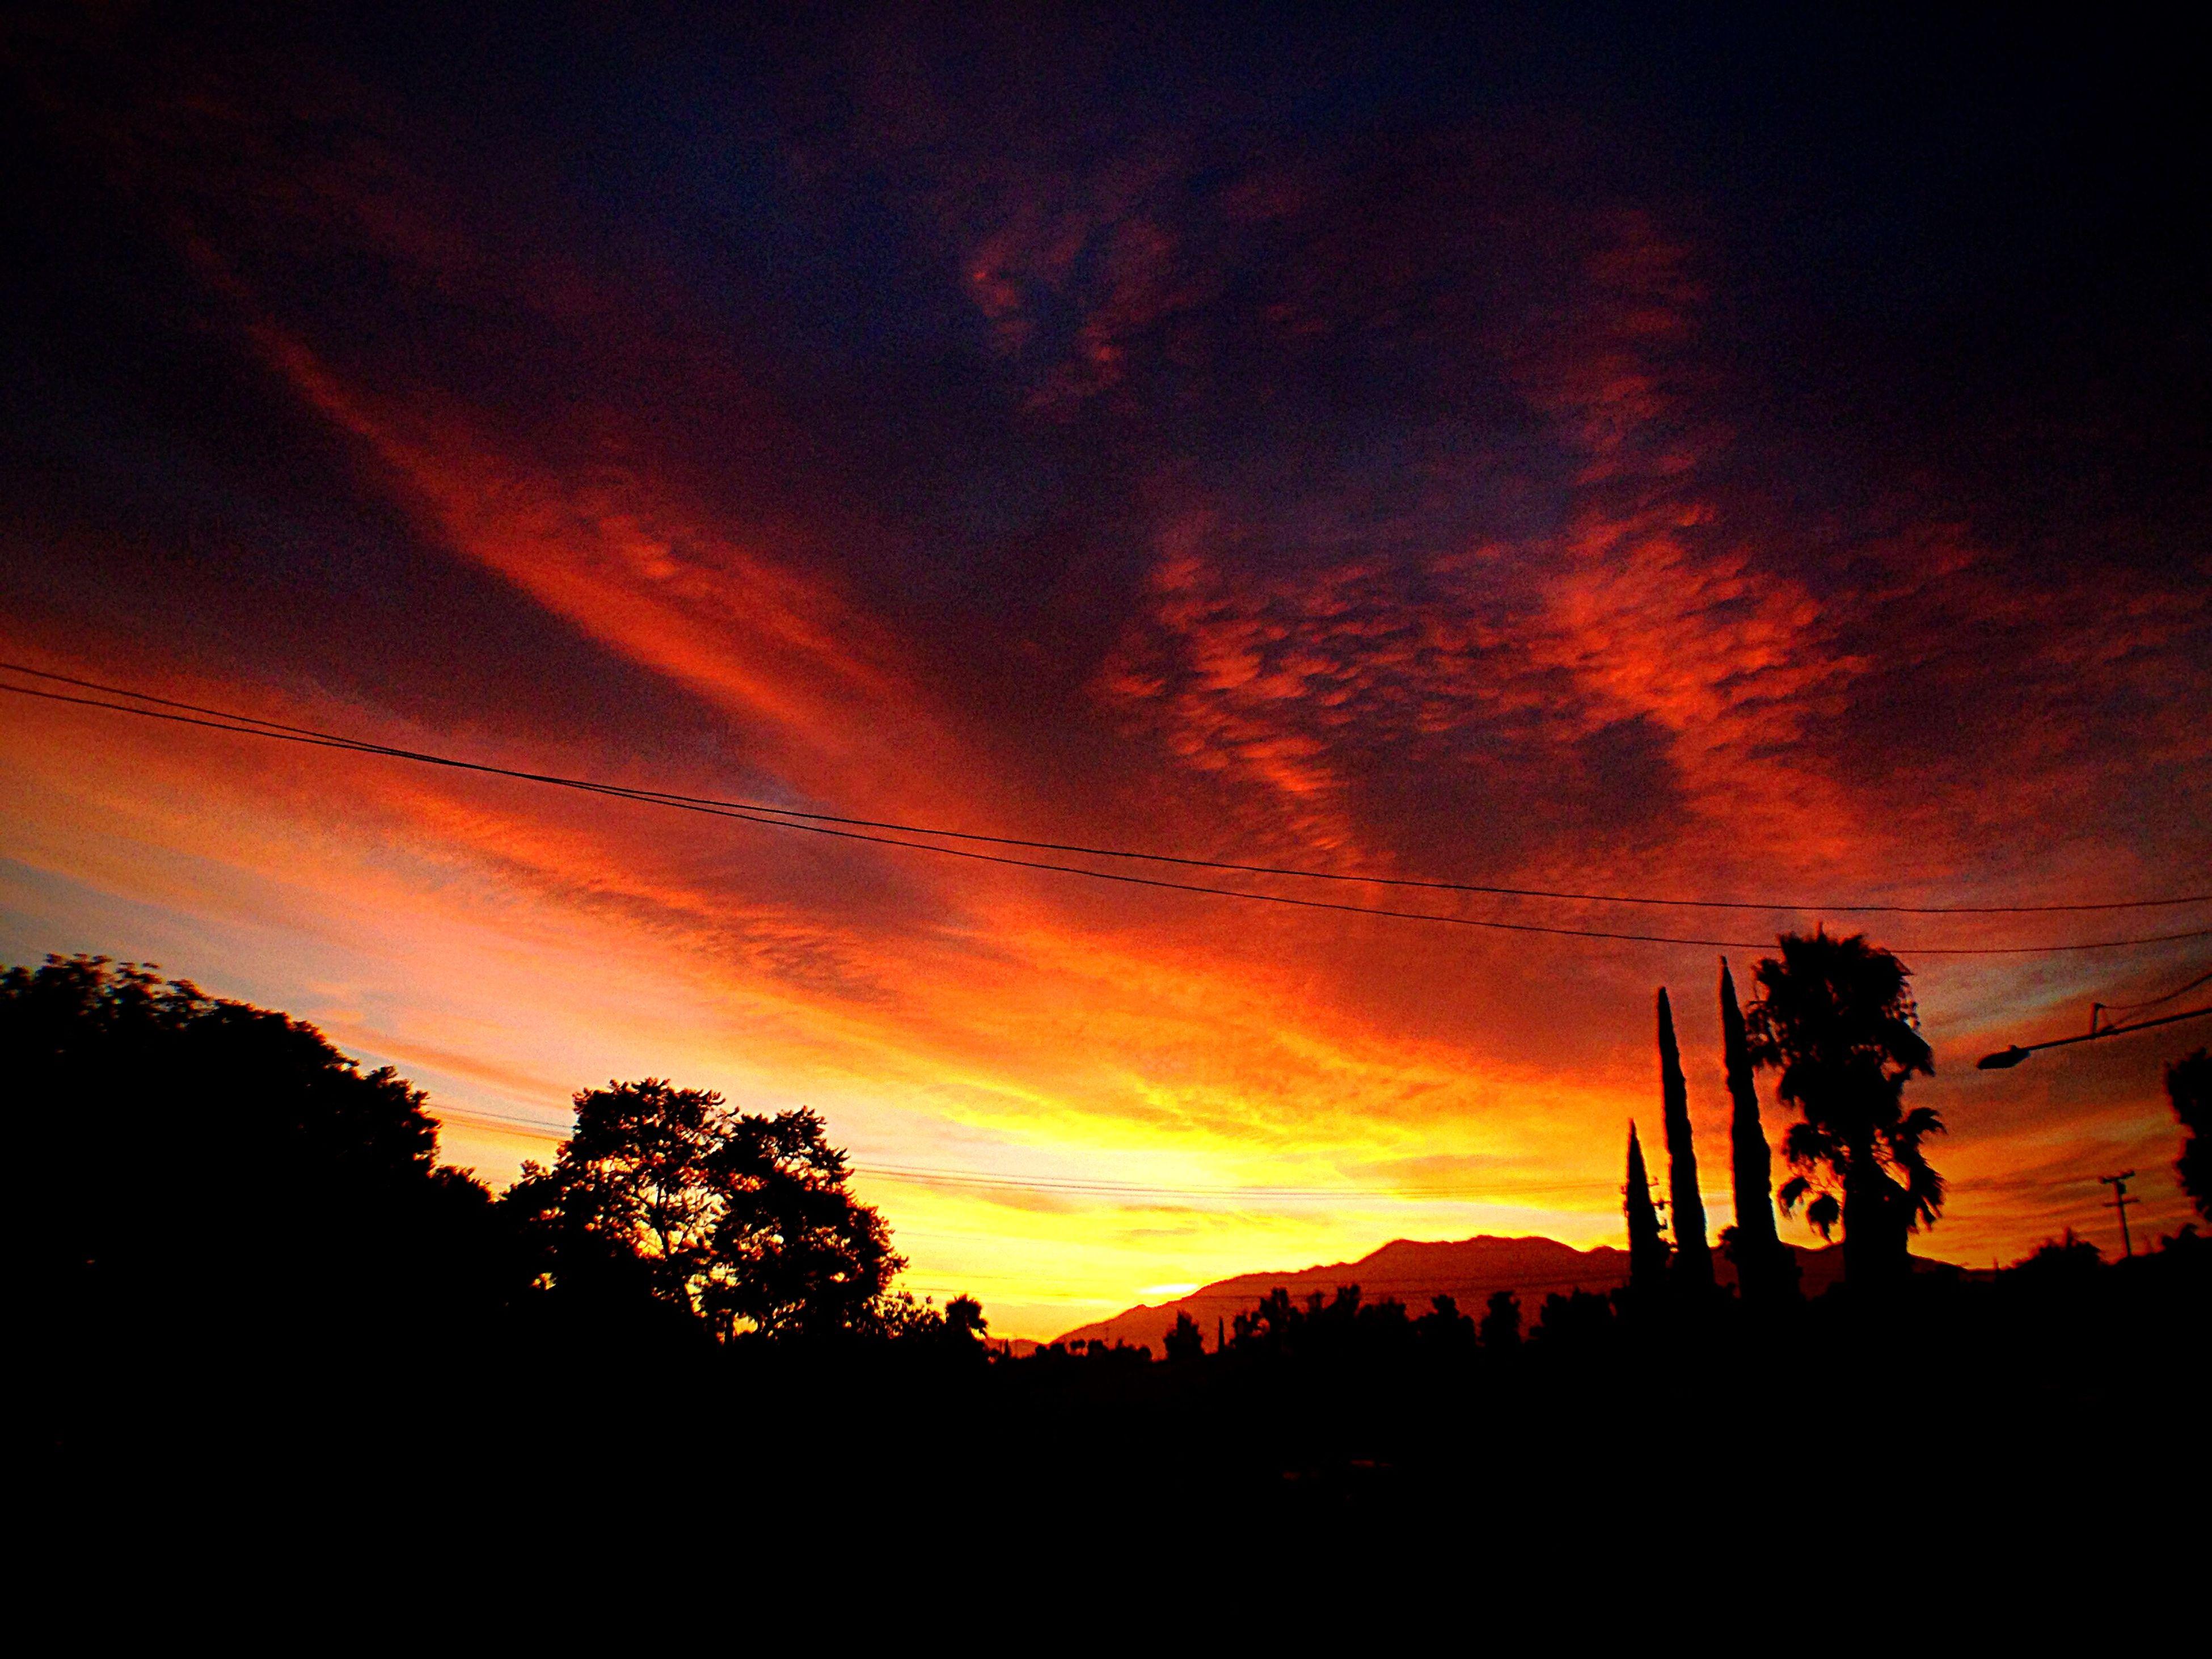 silhouette, sunset, scenics, tree, sky, beauty in nature, tranquil scene, tranquility, orange color, nature, landscape, idyllic, cloud - sky, dramatic sky, cloud, dark, majestic, non-urban scene, dusk, outdoors